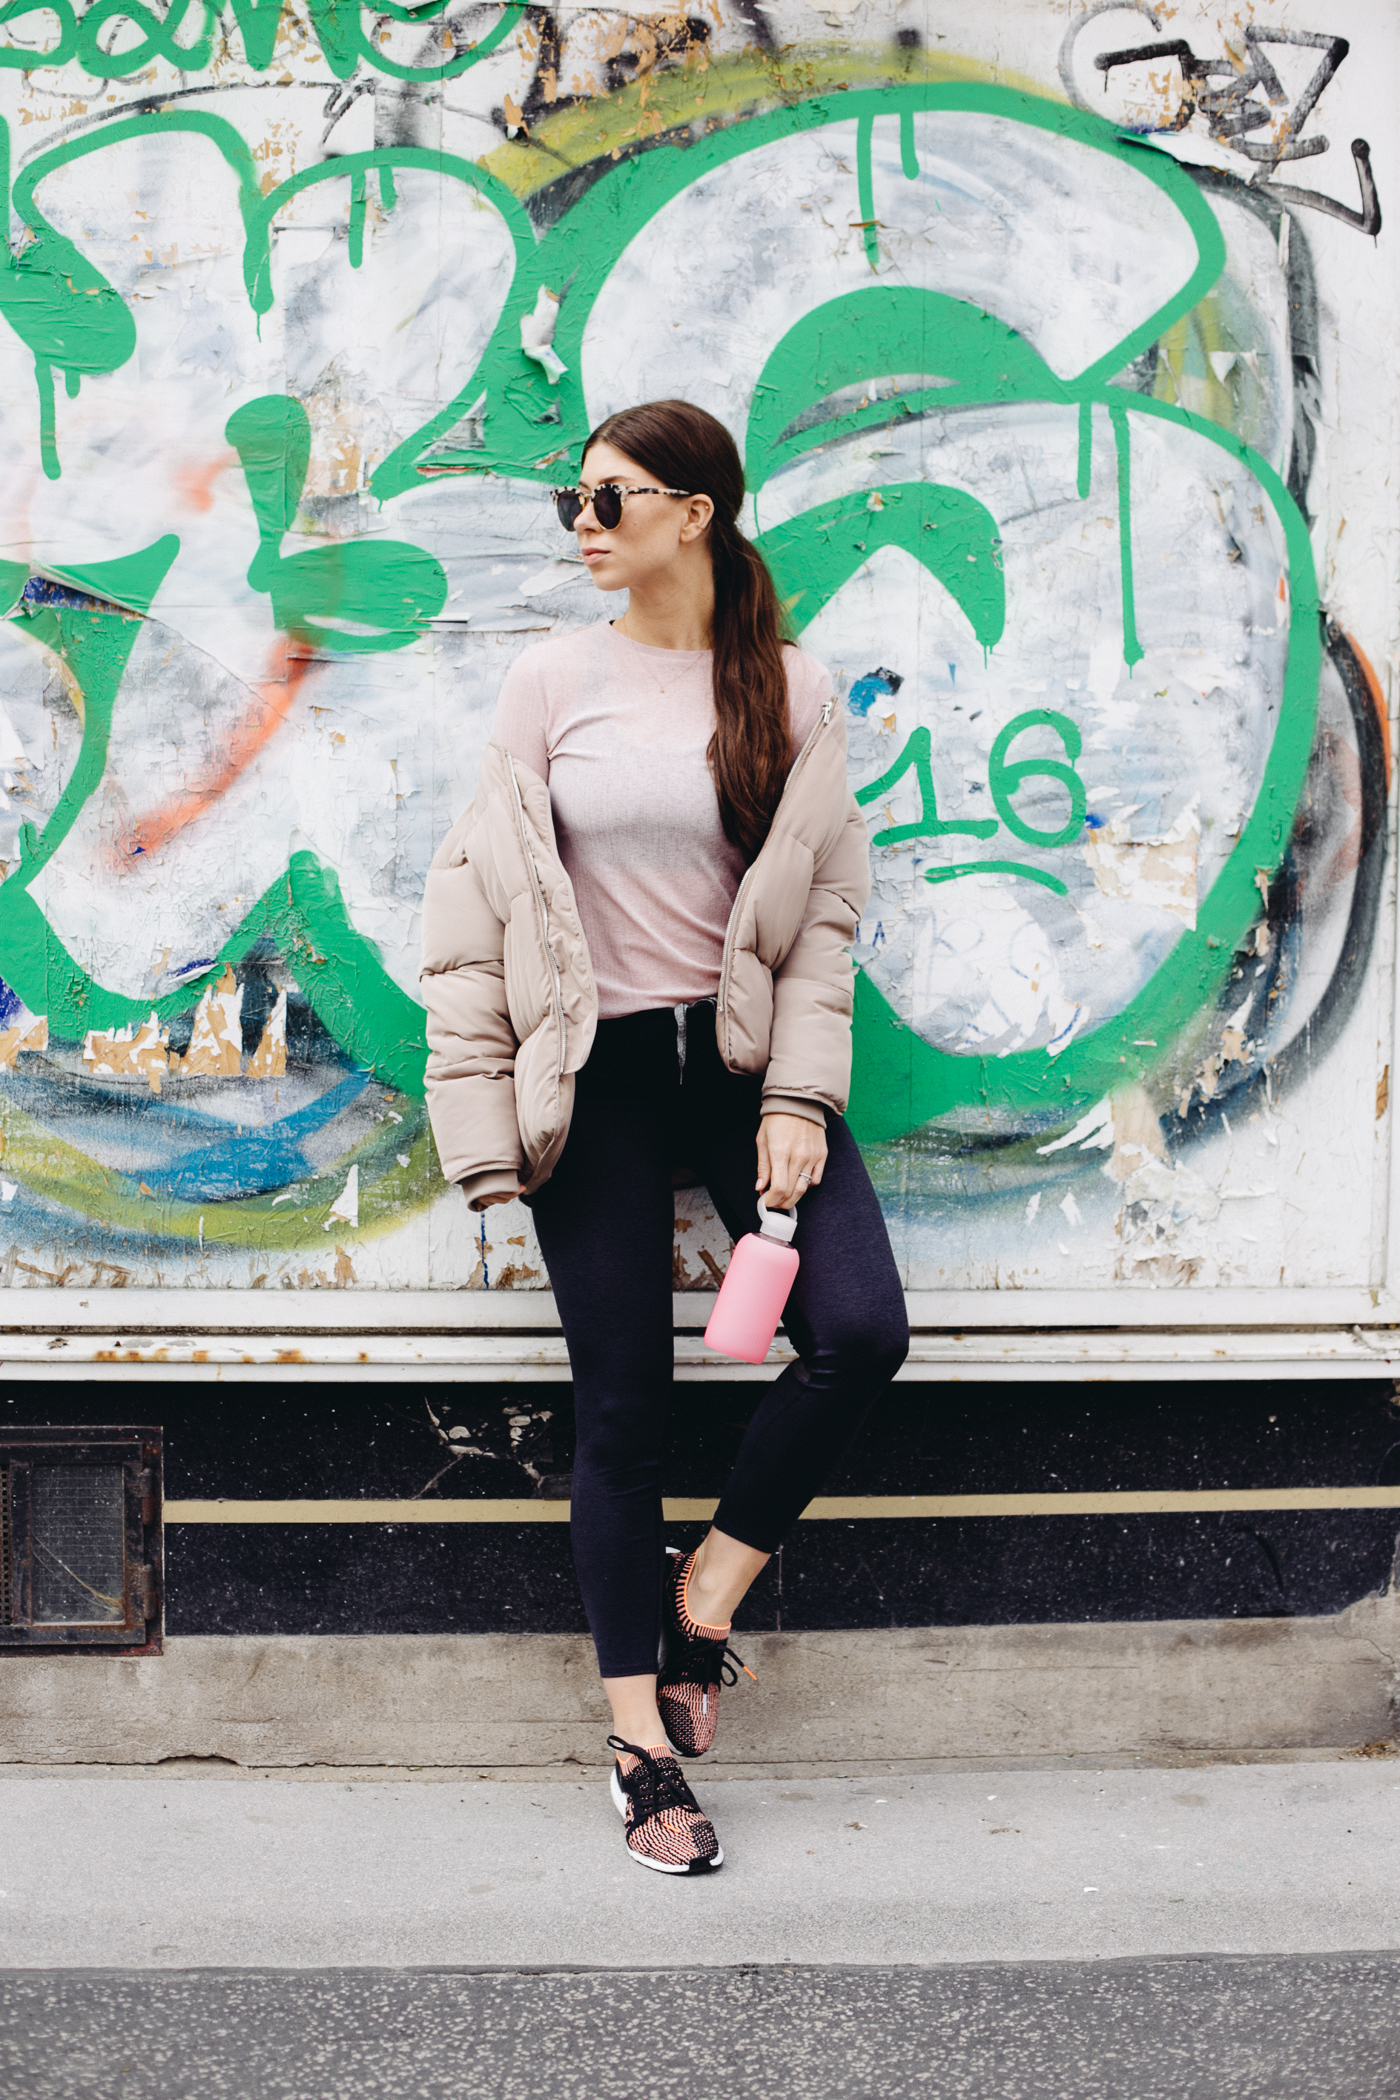 ... bkr water bottle, yoga accessories | Bikinis & Passports Adidas Ultra  Boost women's sneakers 2017, active wear ...